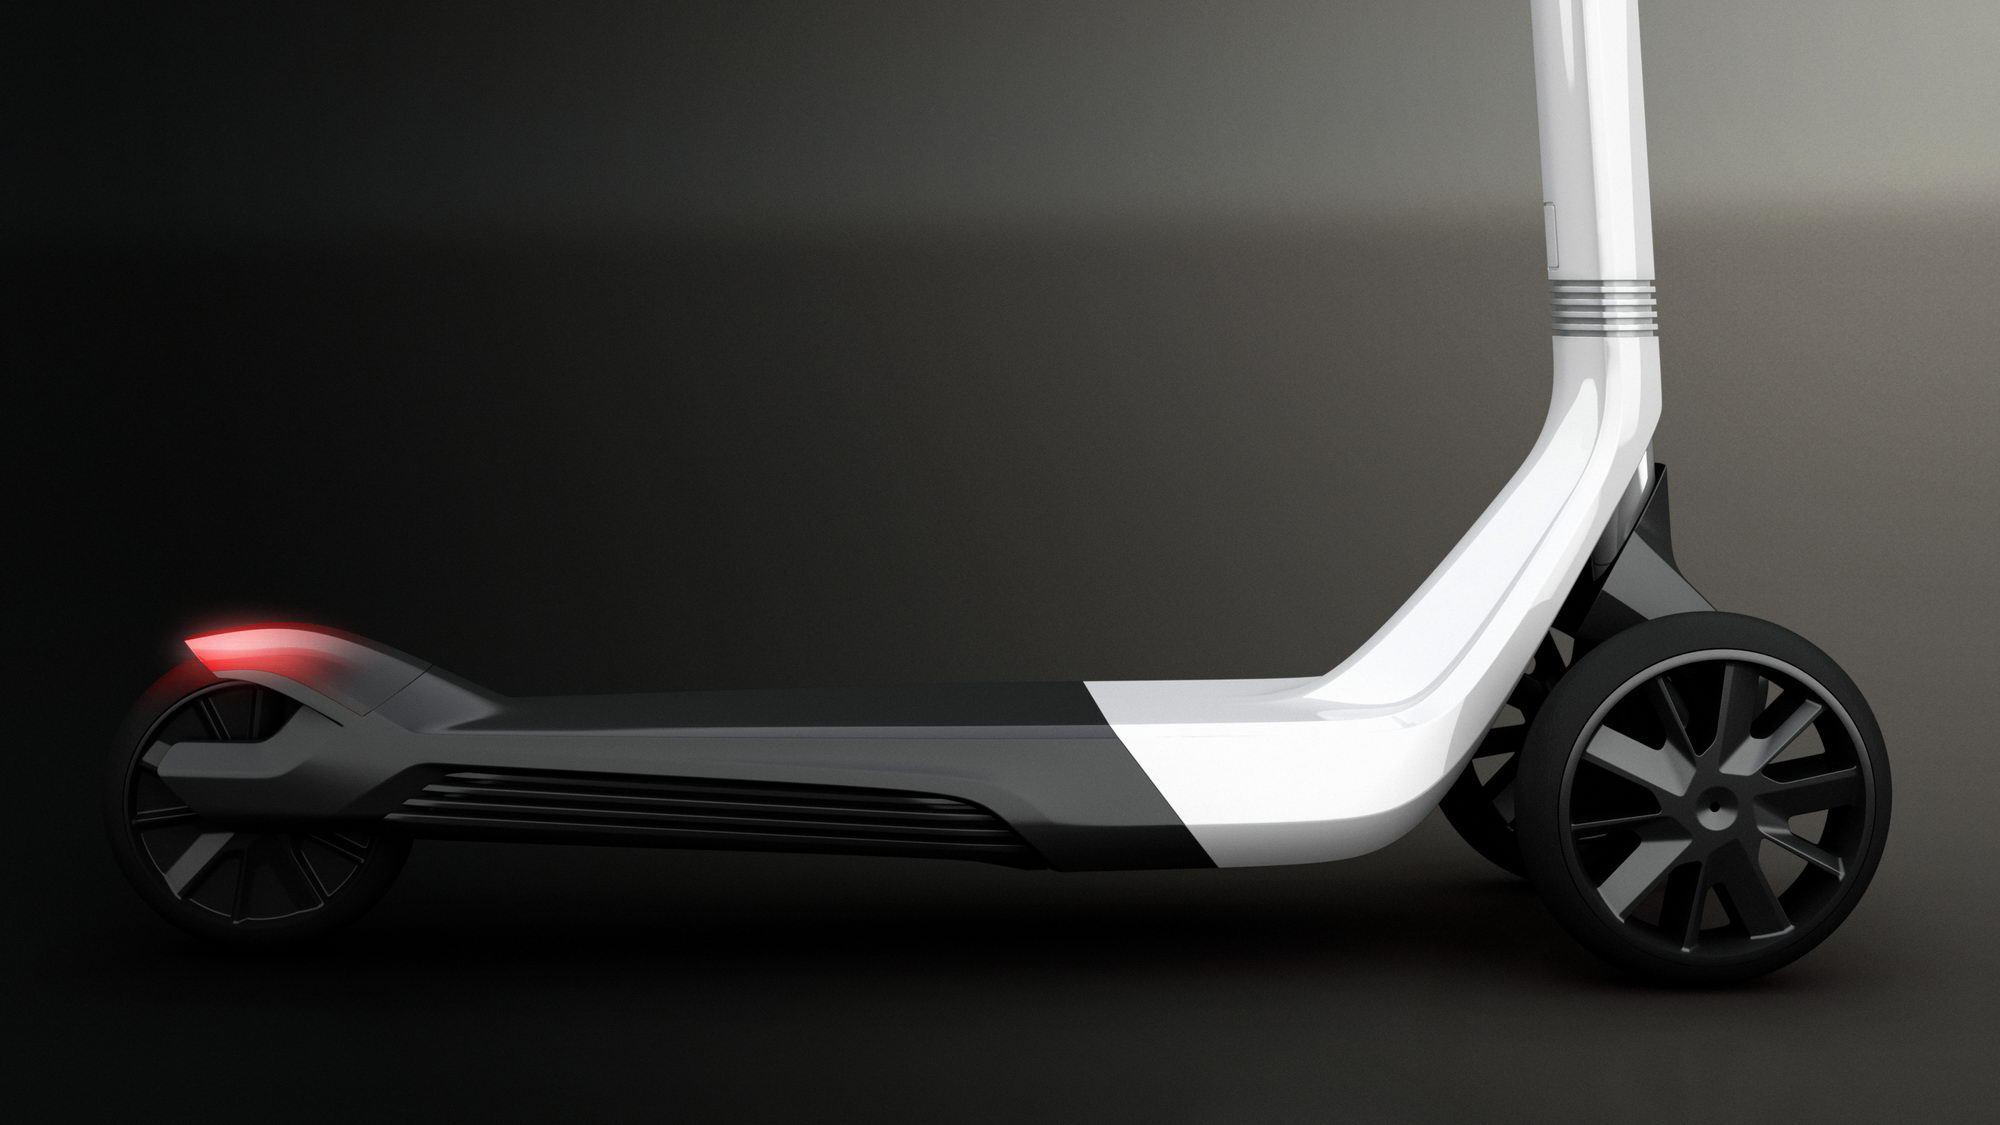 peugeot-design-lab-concept-trotinette-4